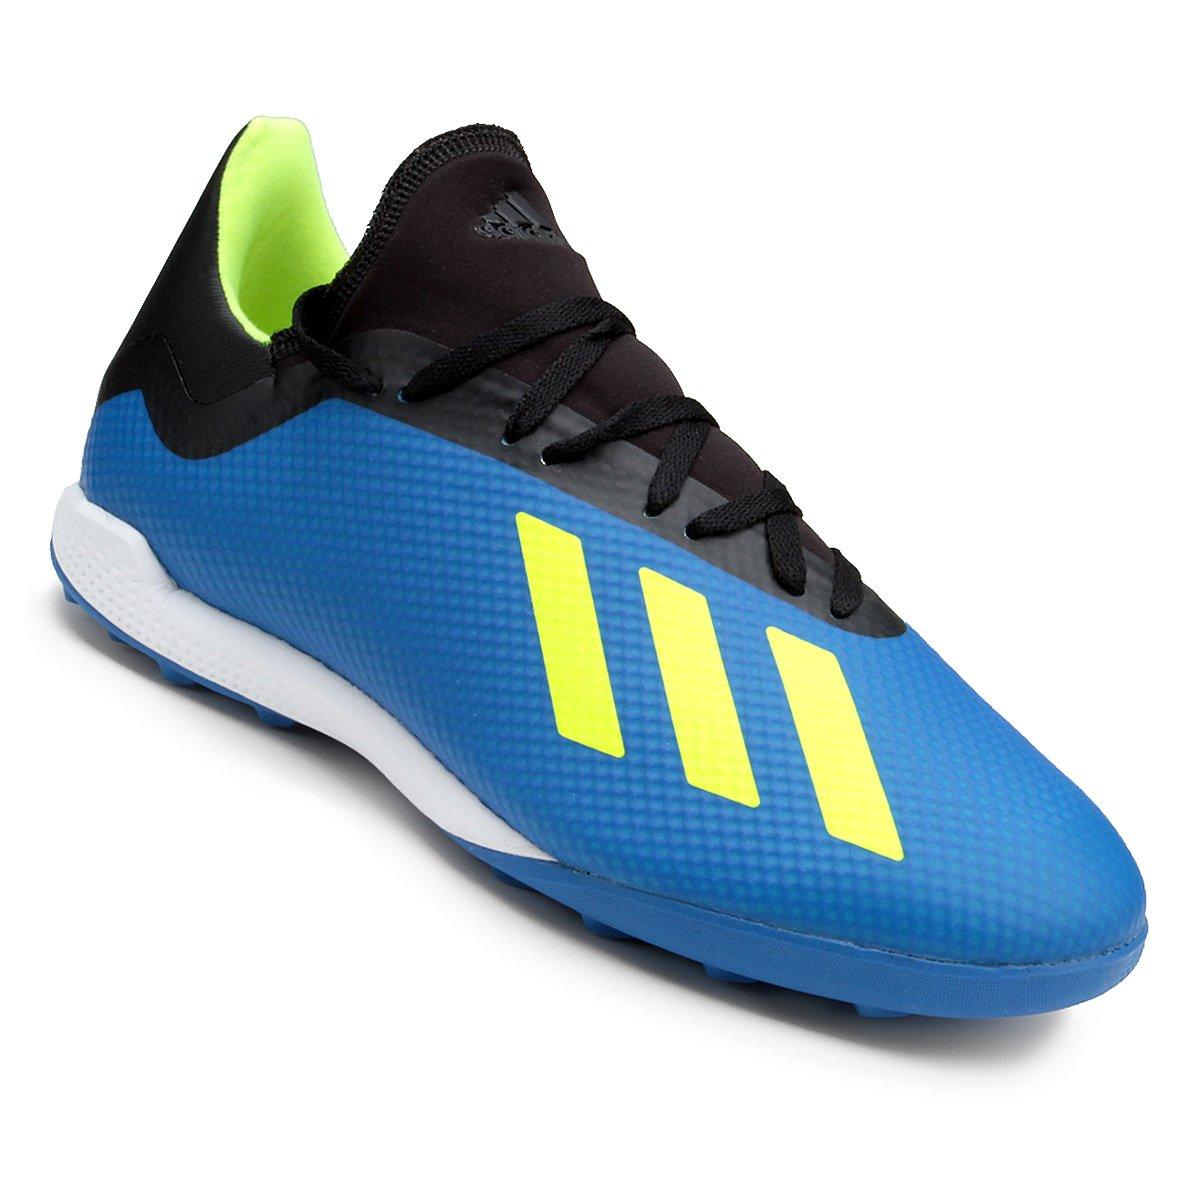 35ccd21aa5 Chuteira Society Adidas X Tango 18 3 TF